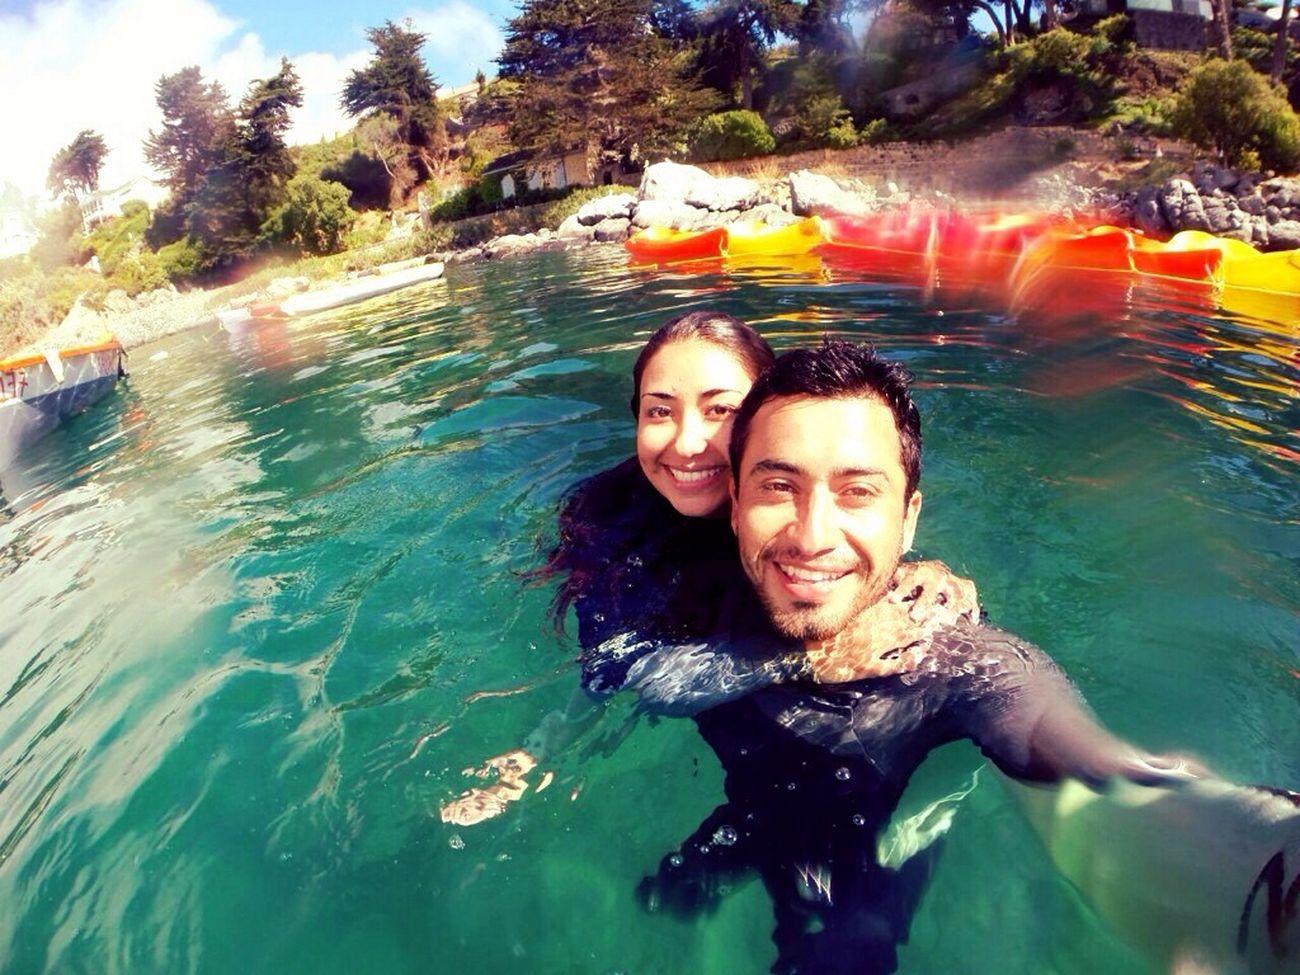 Summer is magic ??? Enjoying Life Kayakzapallar  Momentos Inolvidables Friends